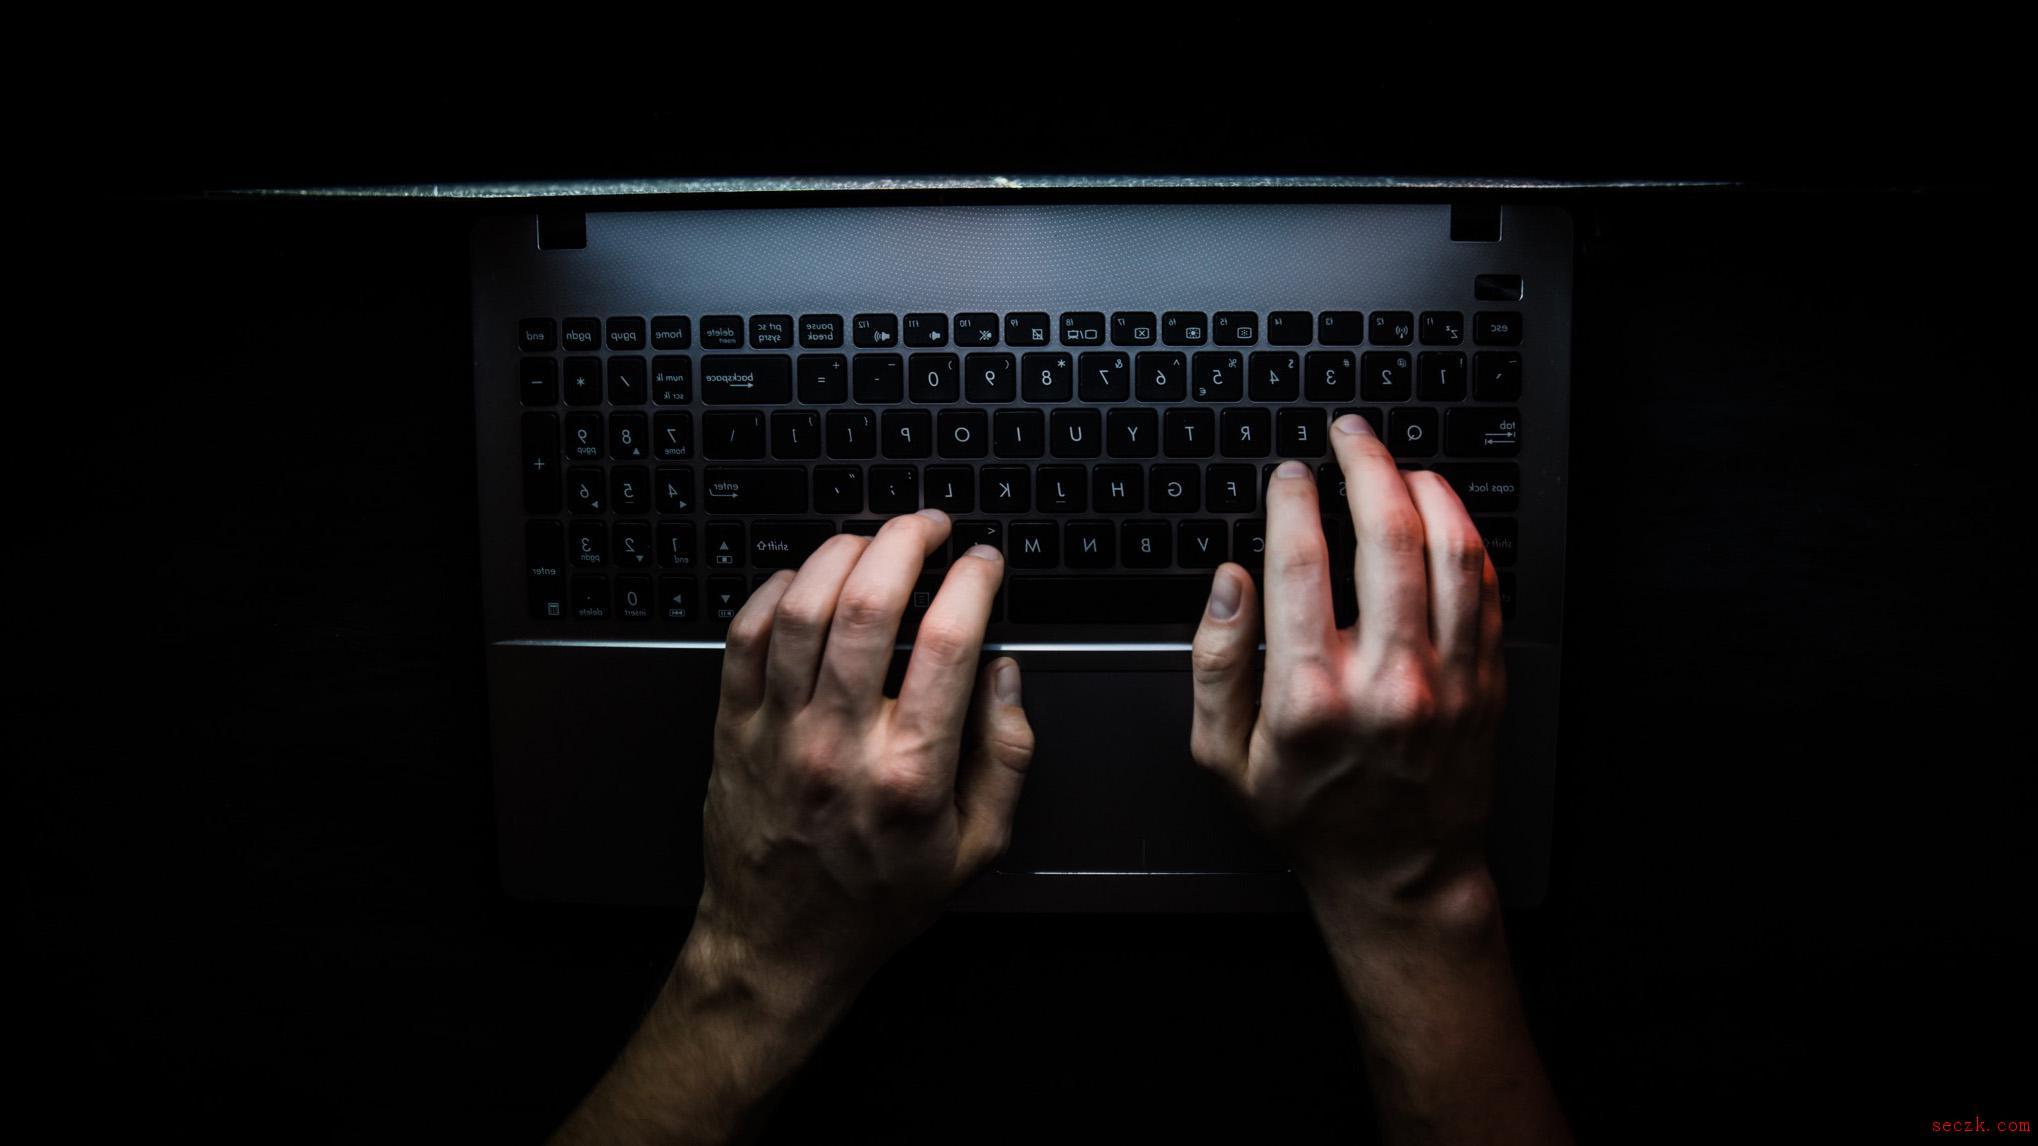 Exim 邮件服务器爆出高危漏洞